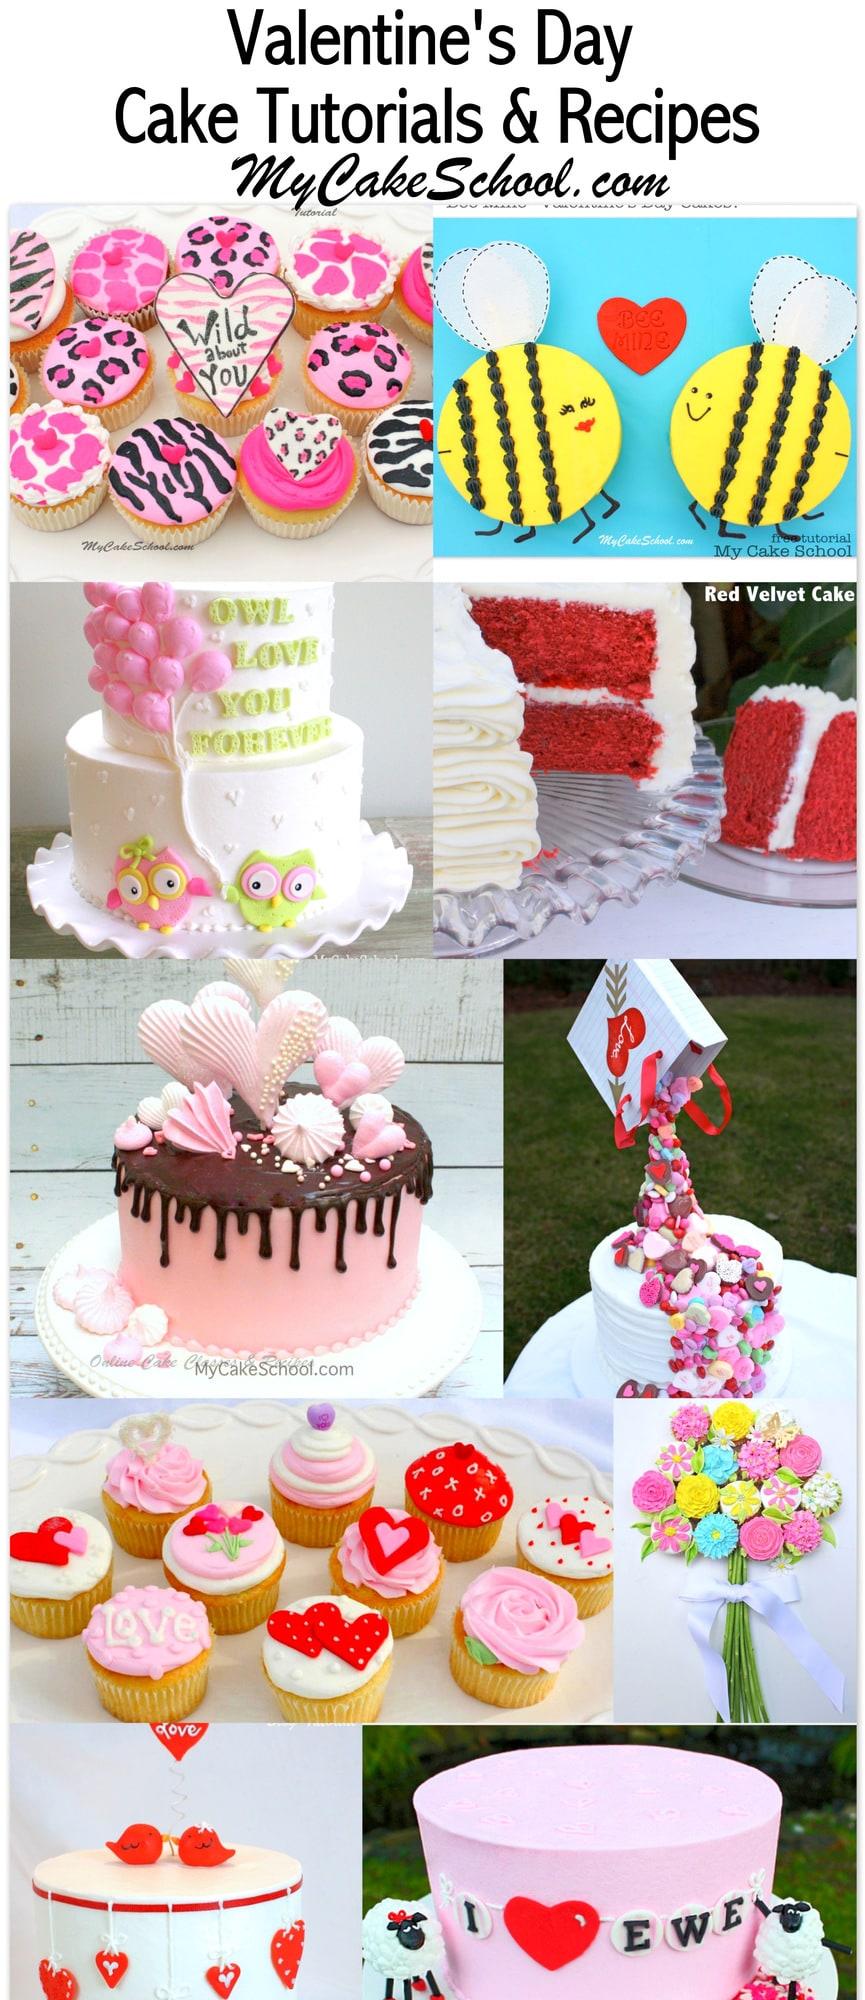 A Roundup of our FAVORITE Valentine's Day Cakes, Tutorials, and Recipes! MyCakeSchool.com.